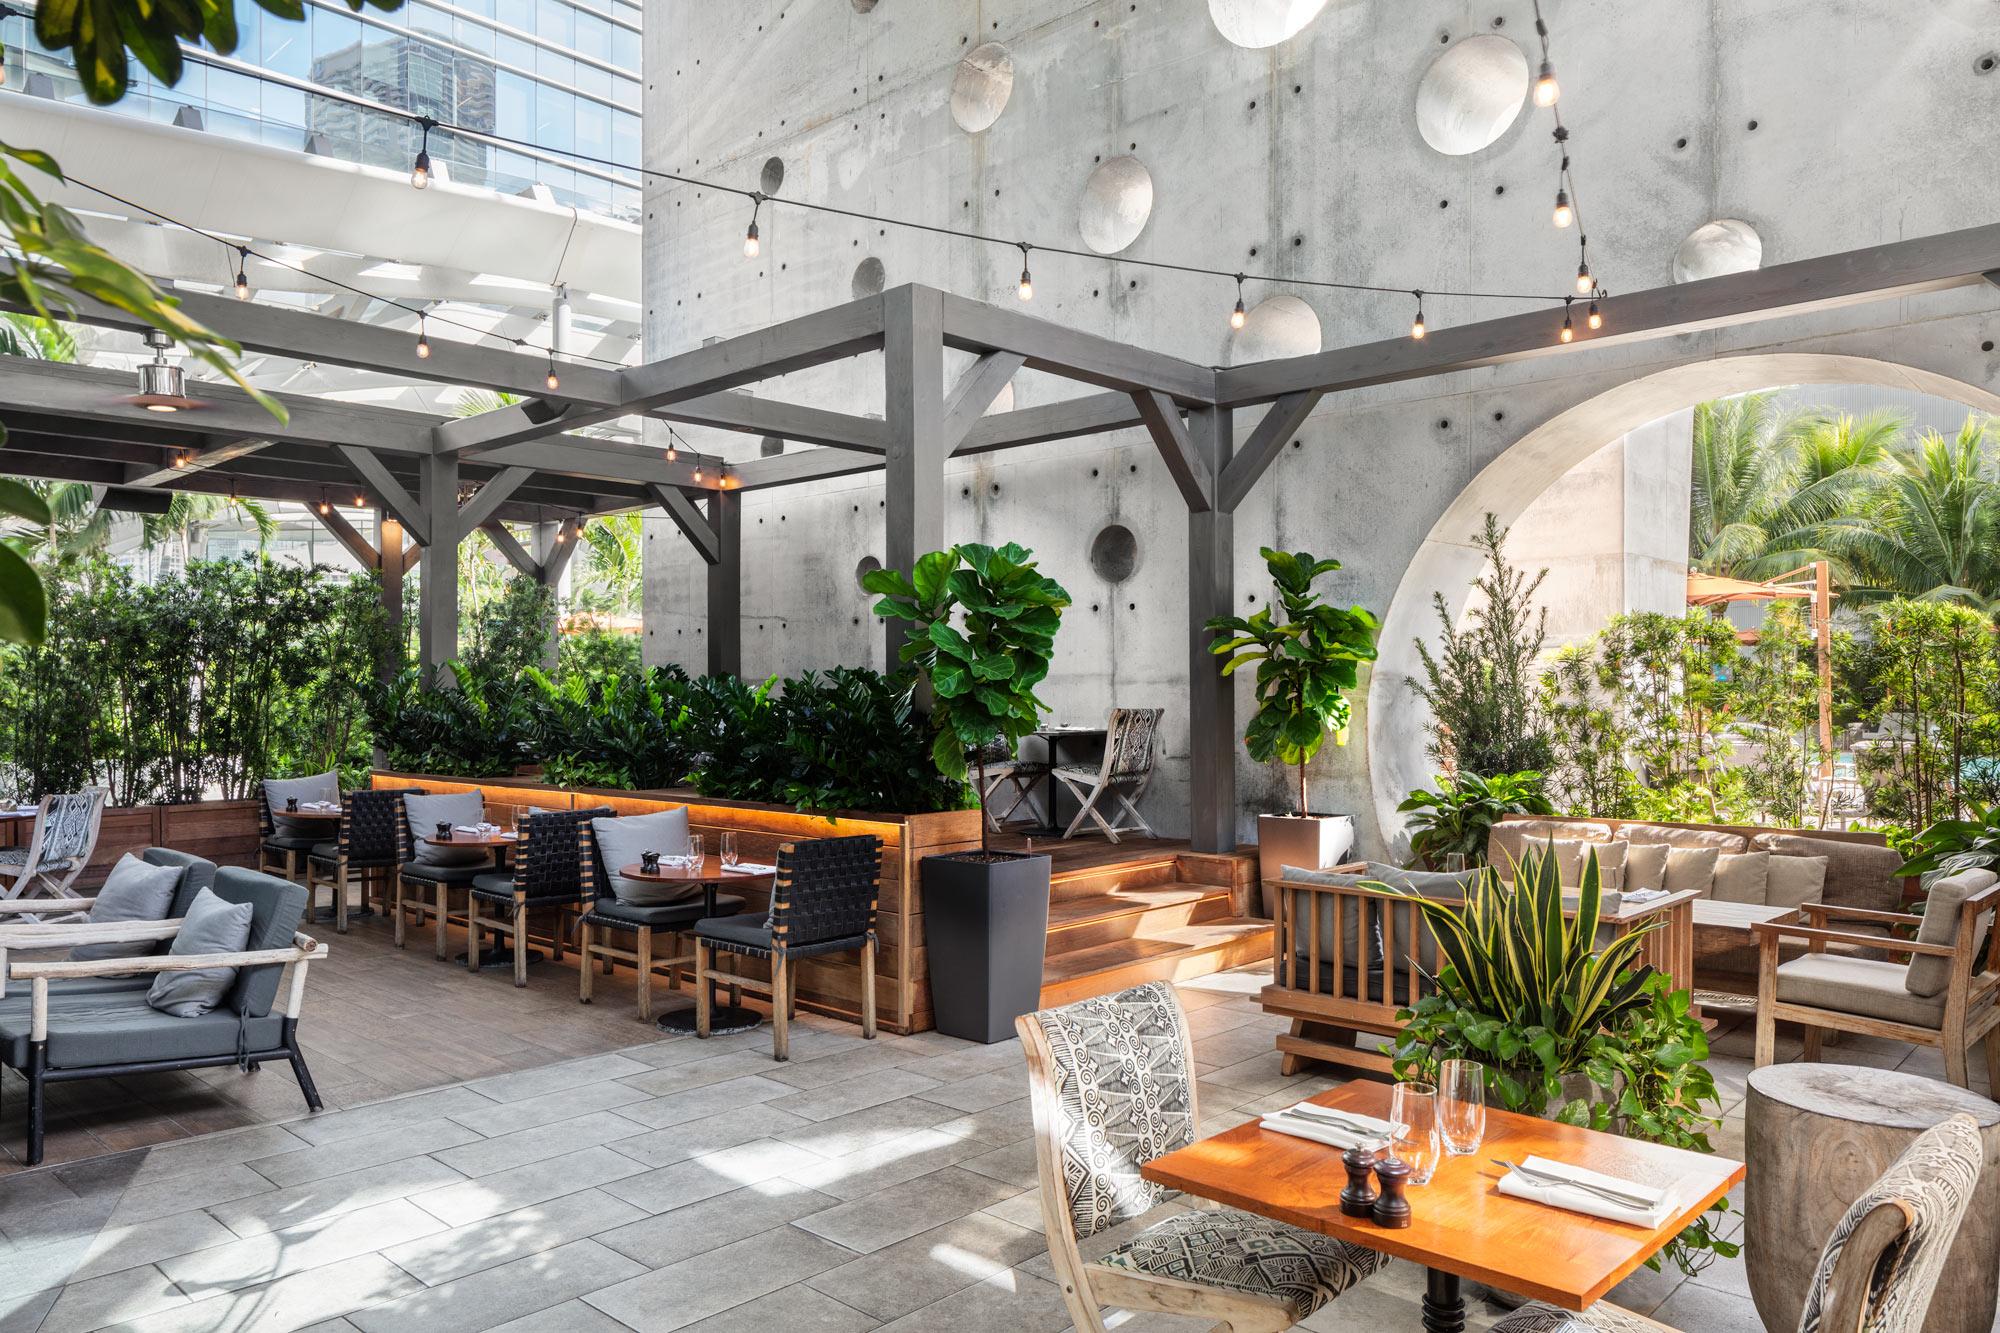 Hotel Restaurant Photography Miami Florida by Swiss Photographer Adrian Kilchherr, USA, Europe, Wordwide